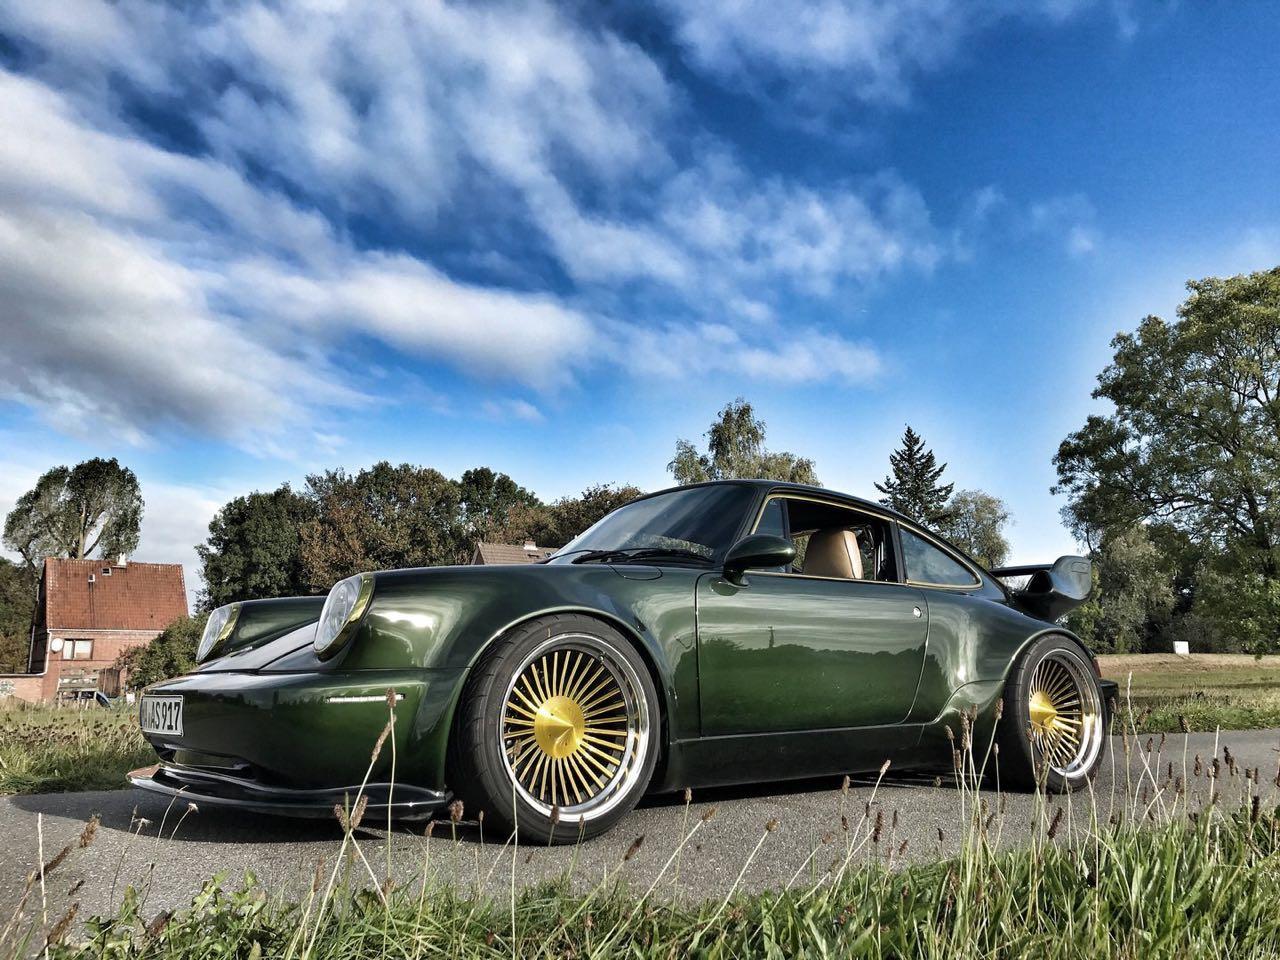 '93 Porsche 965 Turbo Wagenbauanstalt... custom ! 34